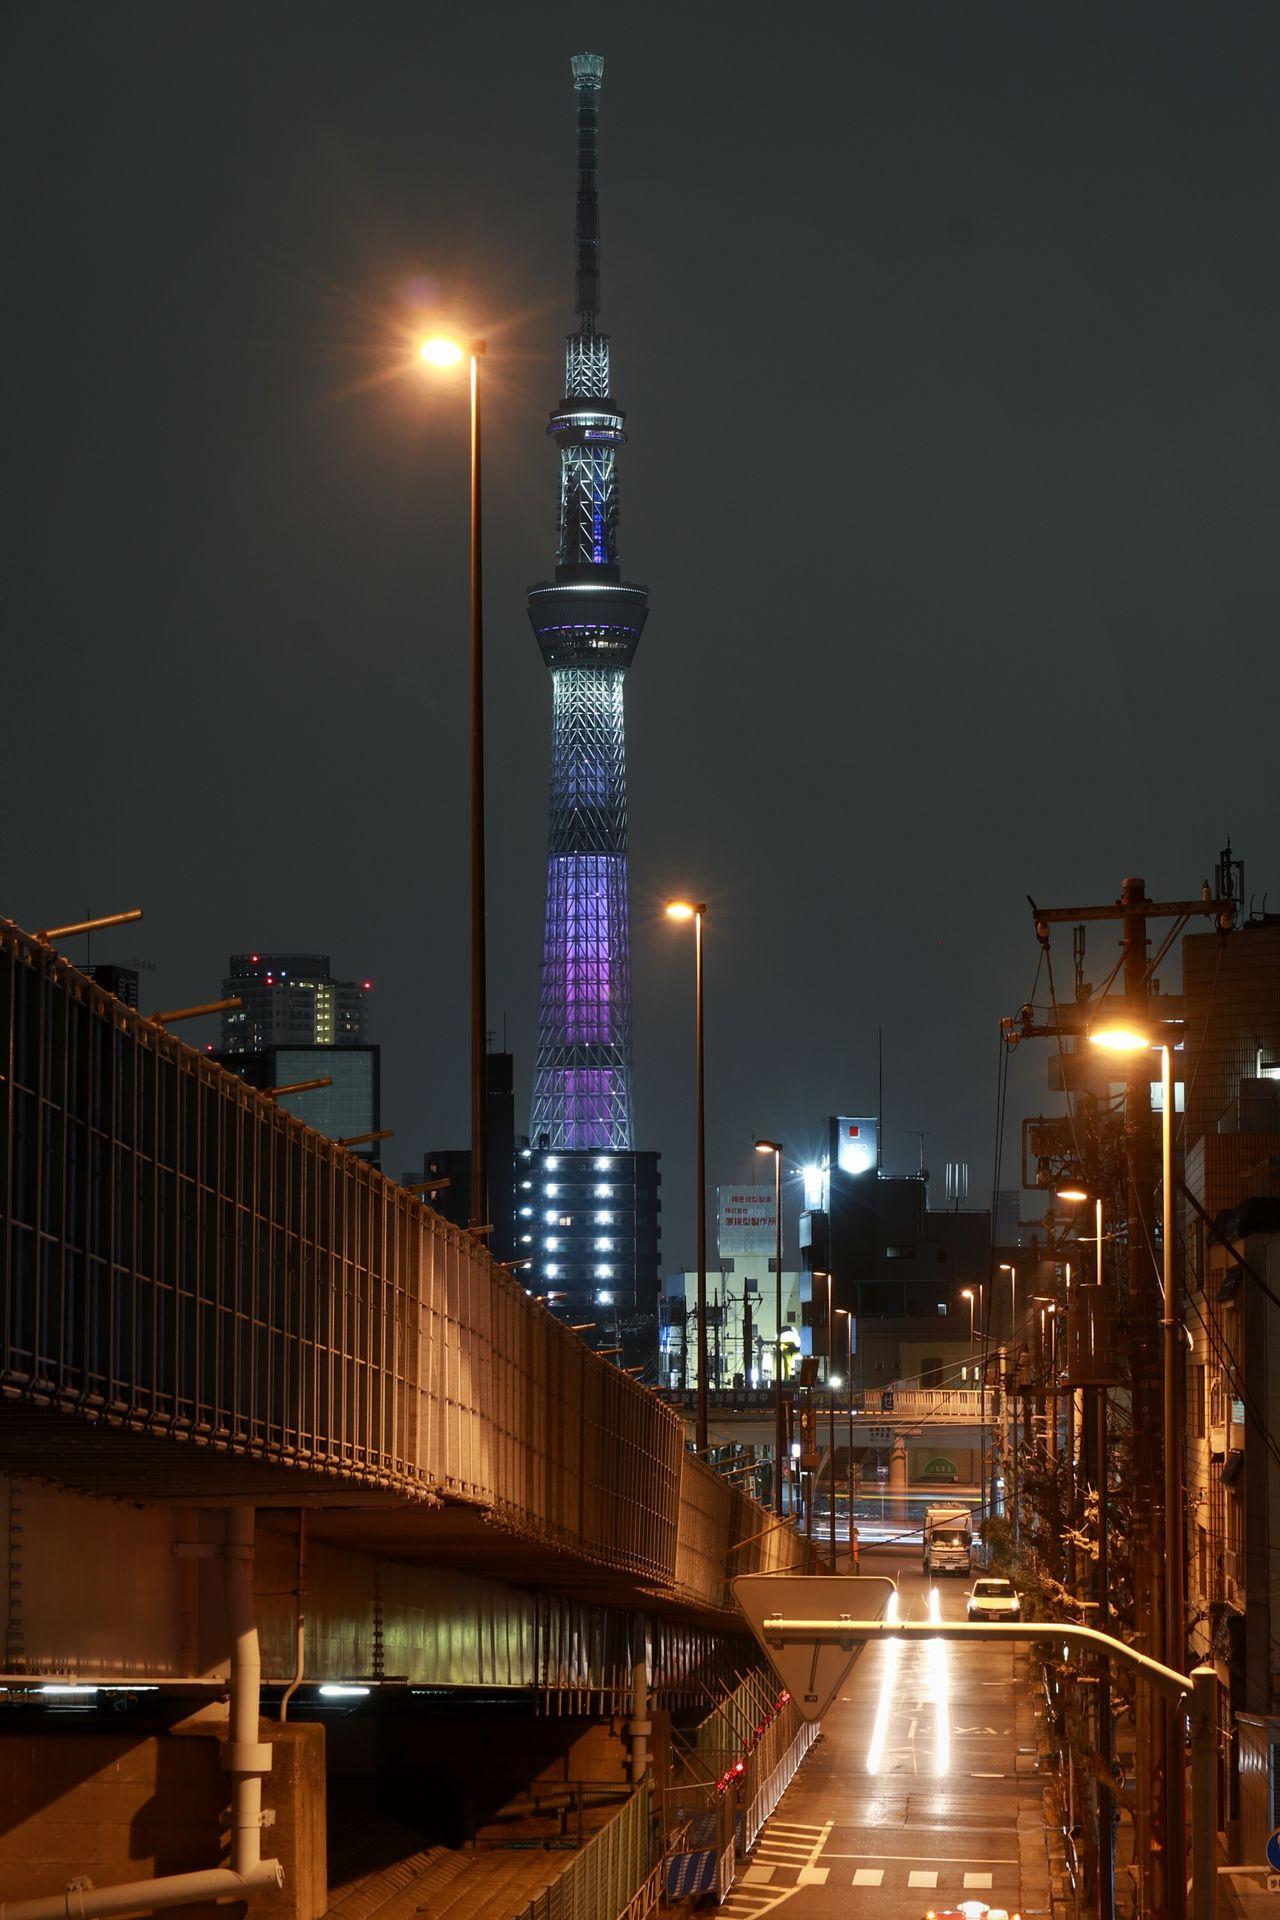 Night Nightphotography Nightview Nightscape Urbanlandscape Japan Tokyo Skytree Tokyoskytree Illuminated Tower